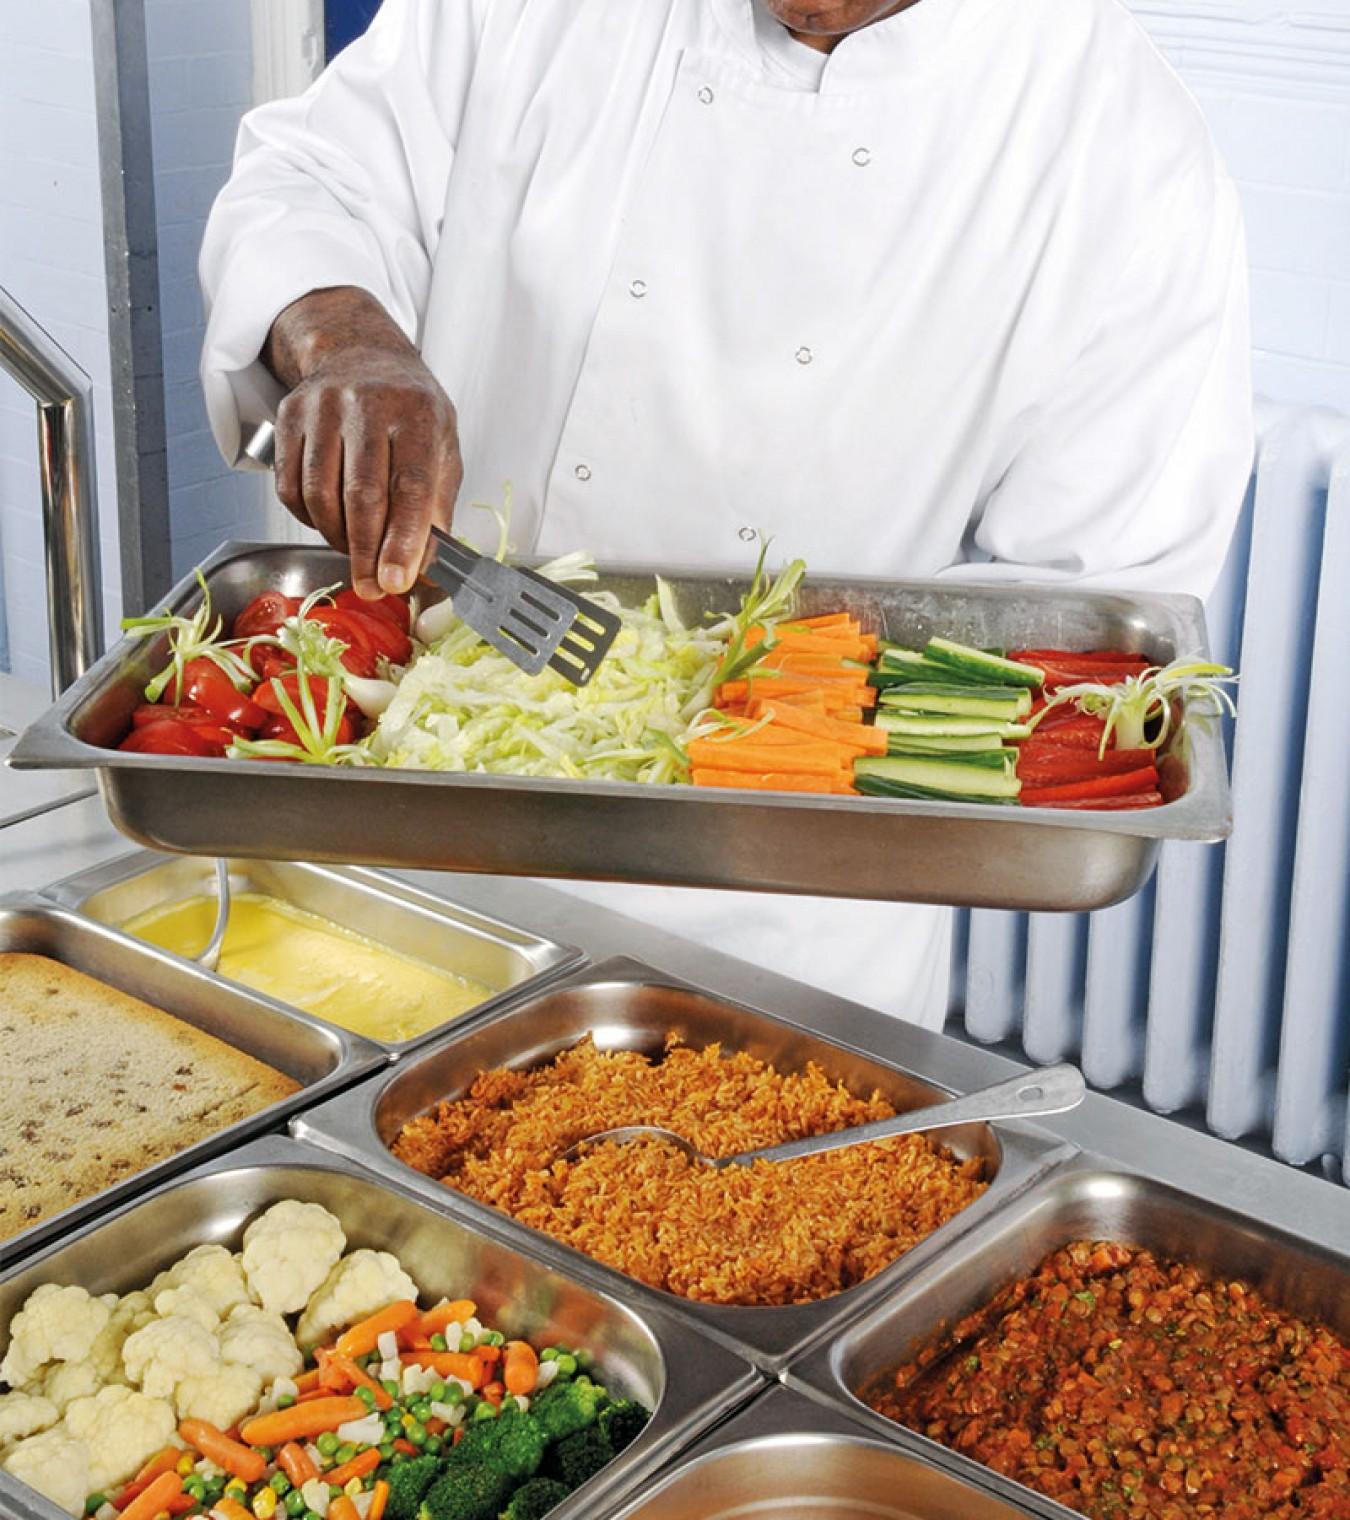 Catering Apprenticeship Advanced Level 3 - testimonial